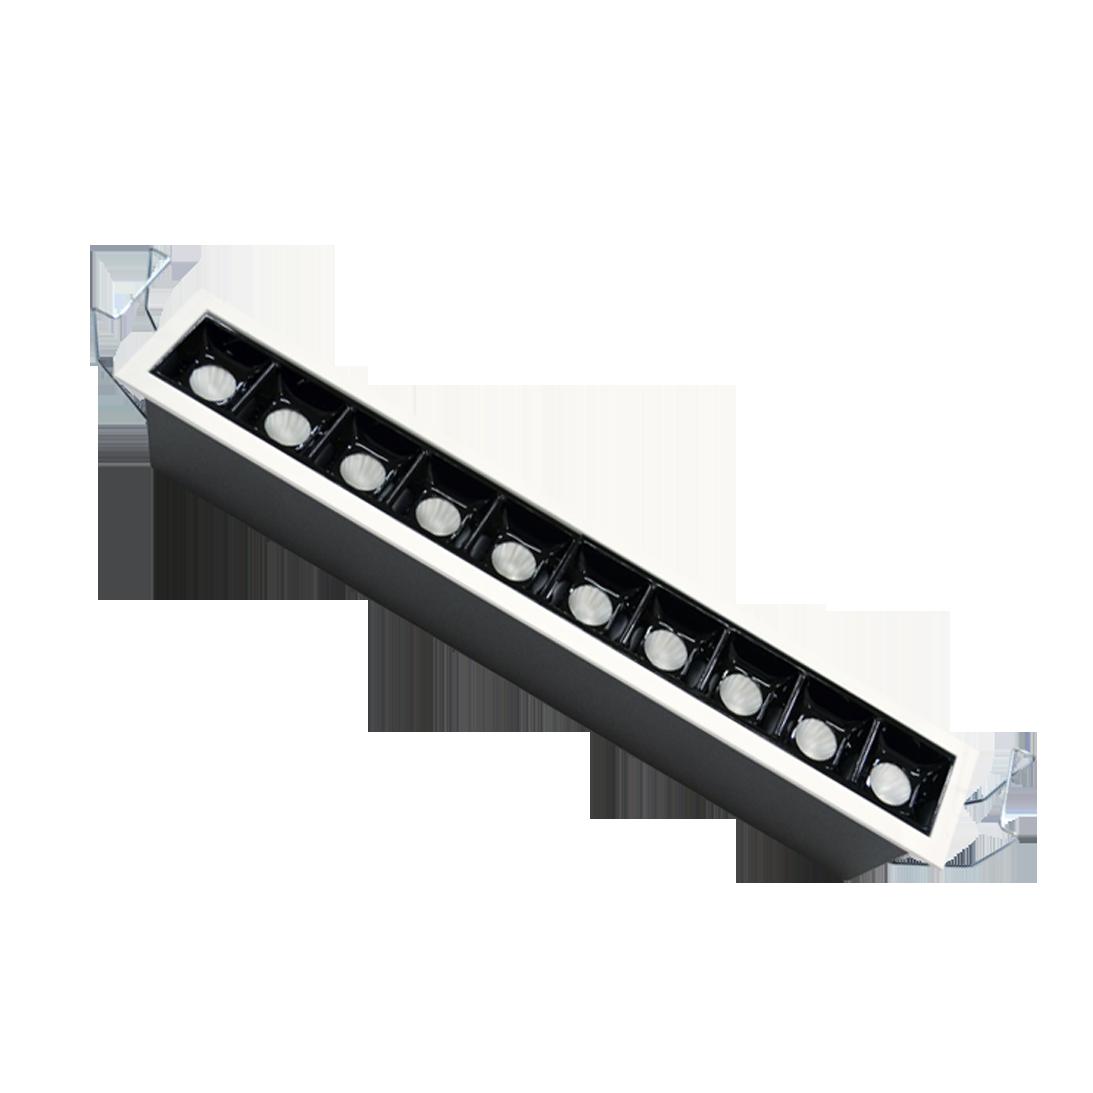 LED Linear Light LL-AC Series